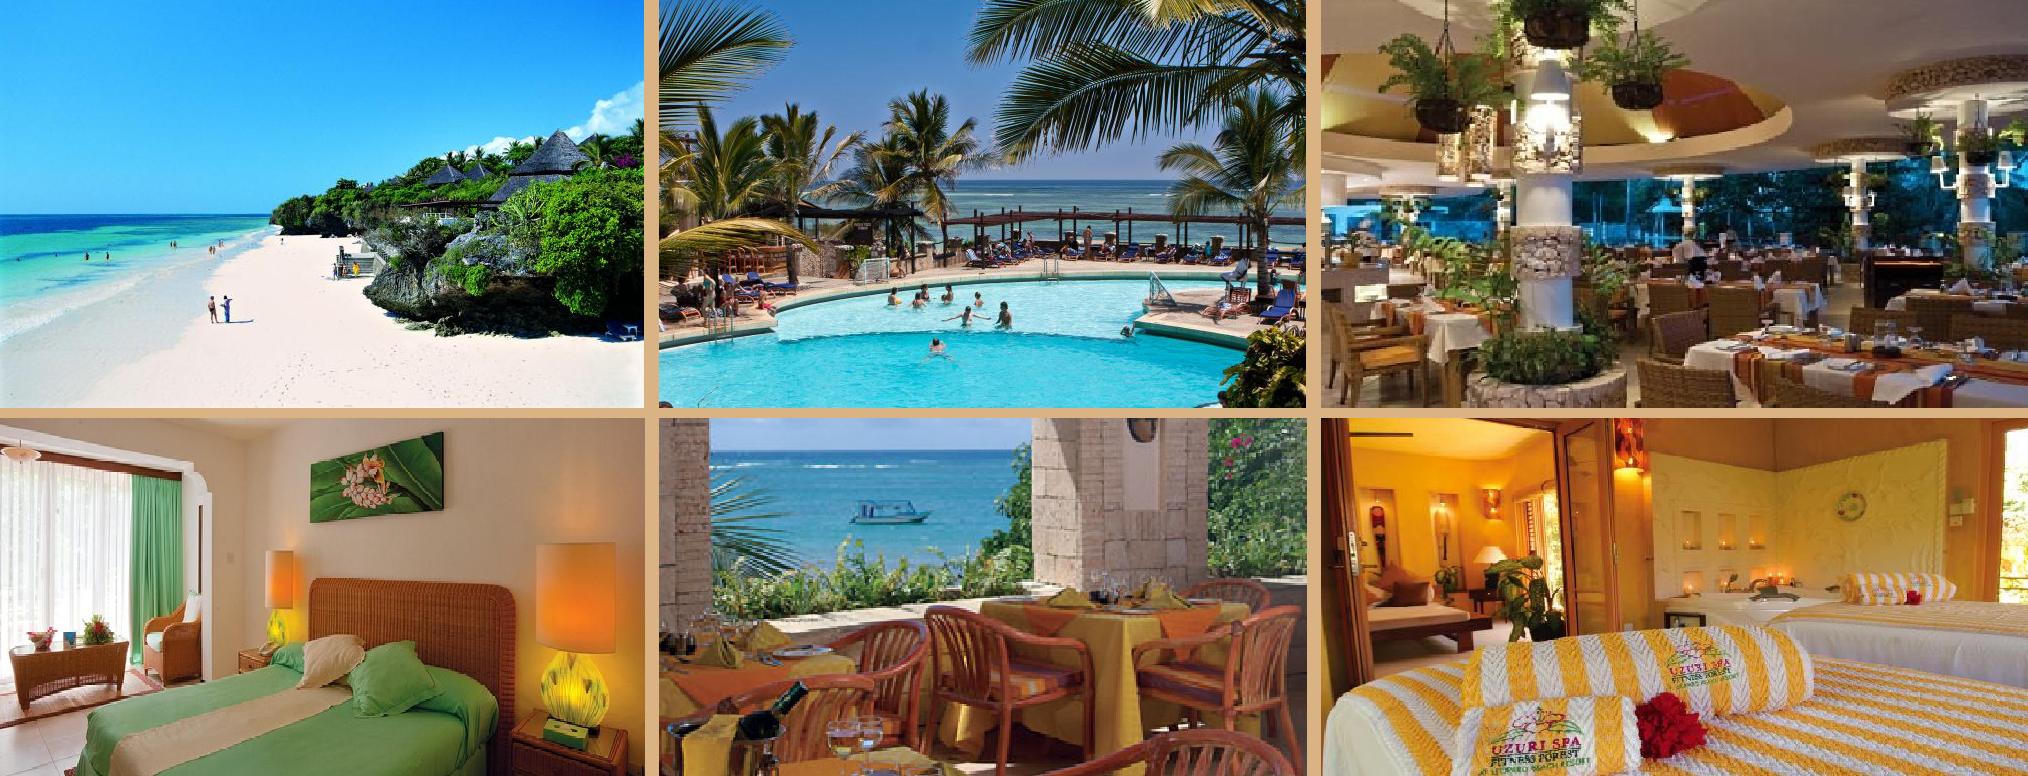 Leopard Beach Resort Kenia Malika Travel